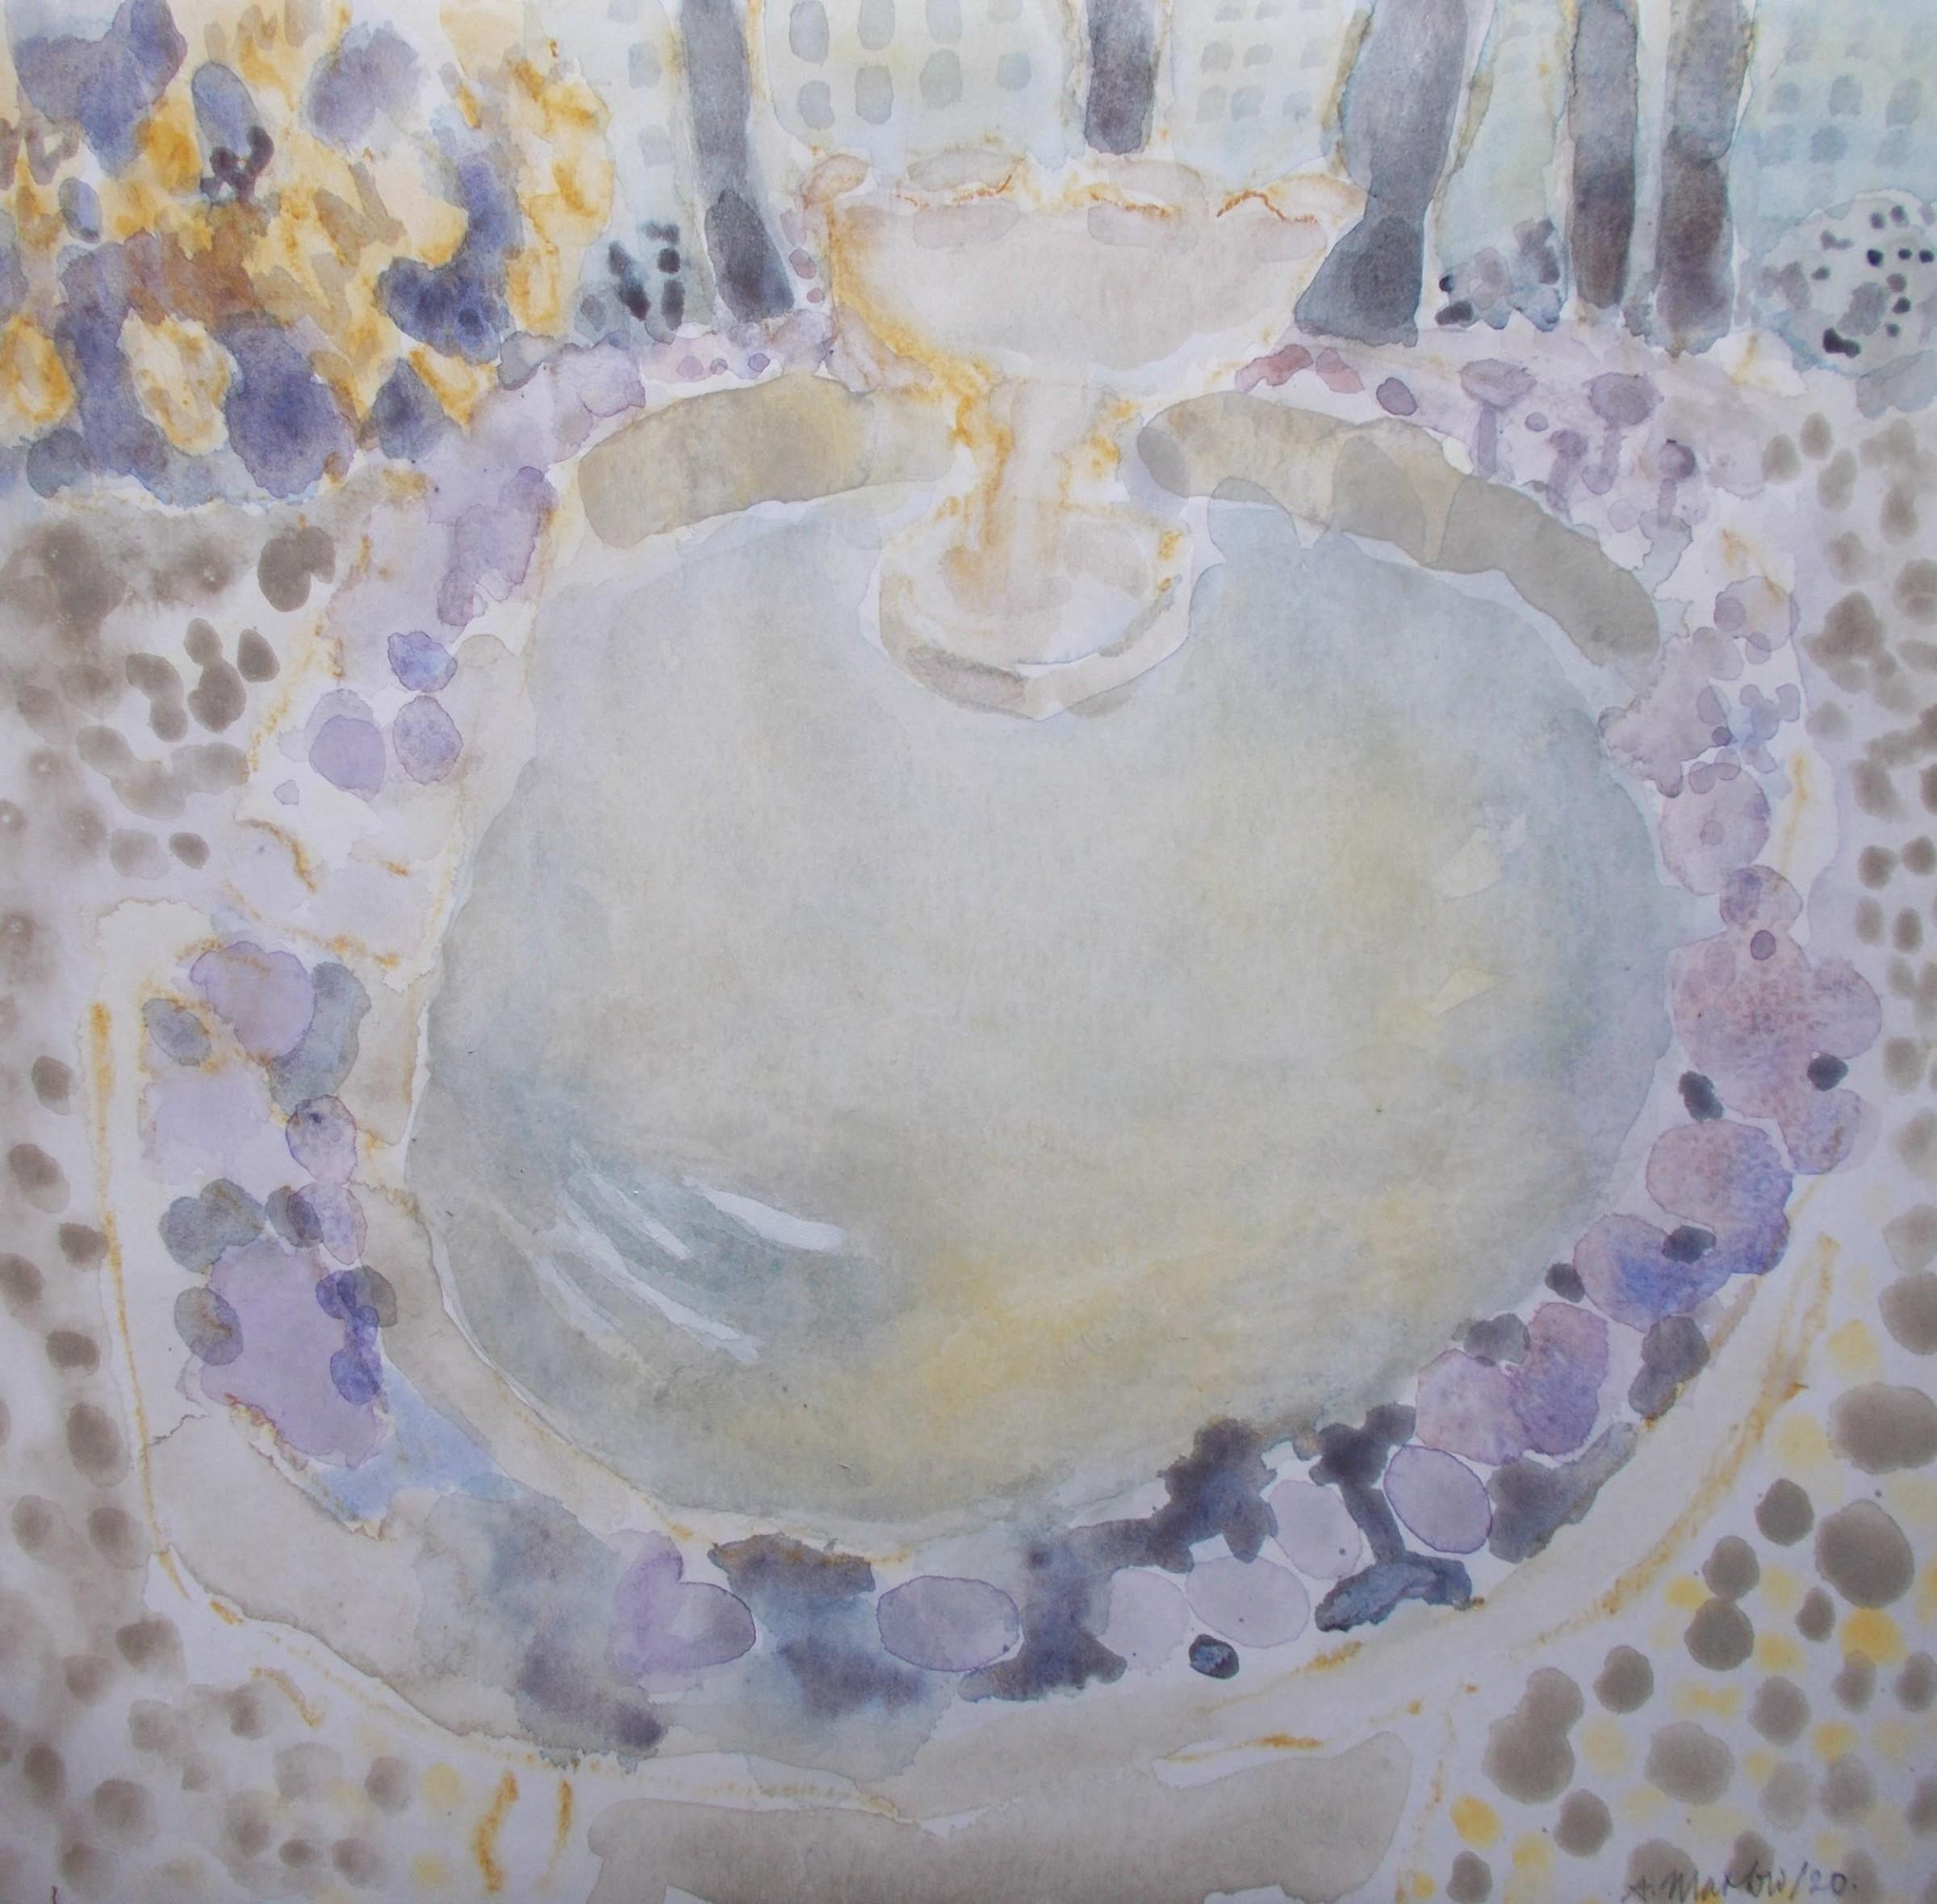 "<span class=""link fancybox-details-link""><a href=""/artists/80-anne-marlow/works/12094-anne-marlow-a-city-pool/"">View Detail Page</a></span><div class=""artist""><span class=""artist""><strong>Anne Marlow</strong></span></div><div class=""title""><em>A City Pool</em></div><div class=""medium"">watercolour</div><div class=""dimensions"">Frame: 37 x 40 cm<br /> Artwork: 27 x 30 cm</div><div class=""price"">£275.00</div>"